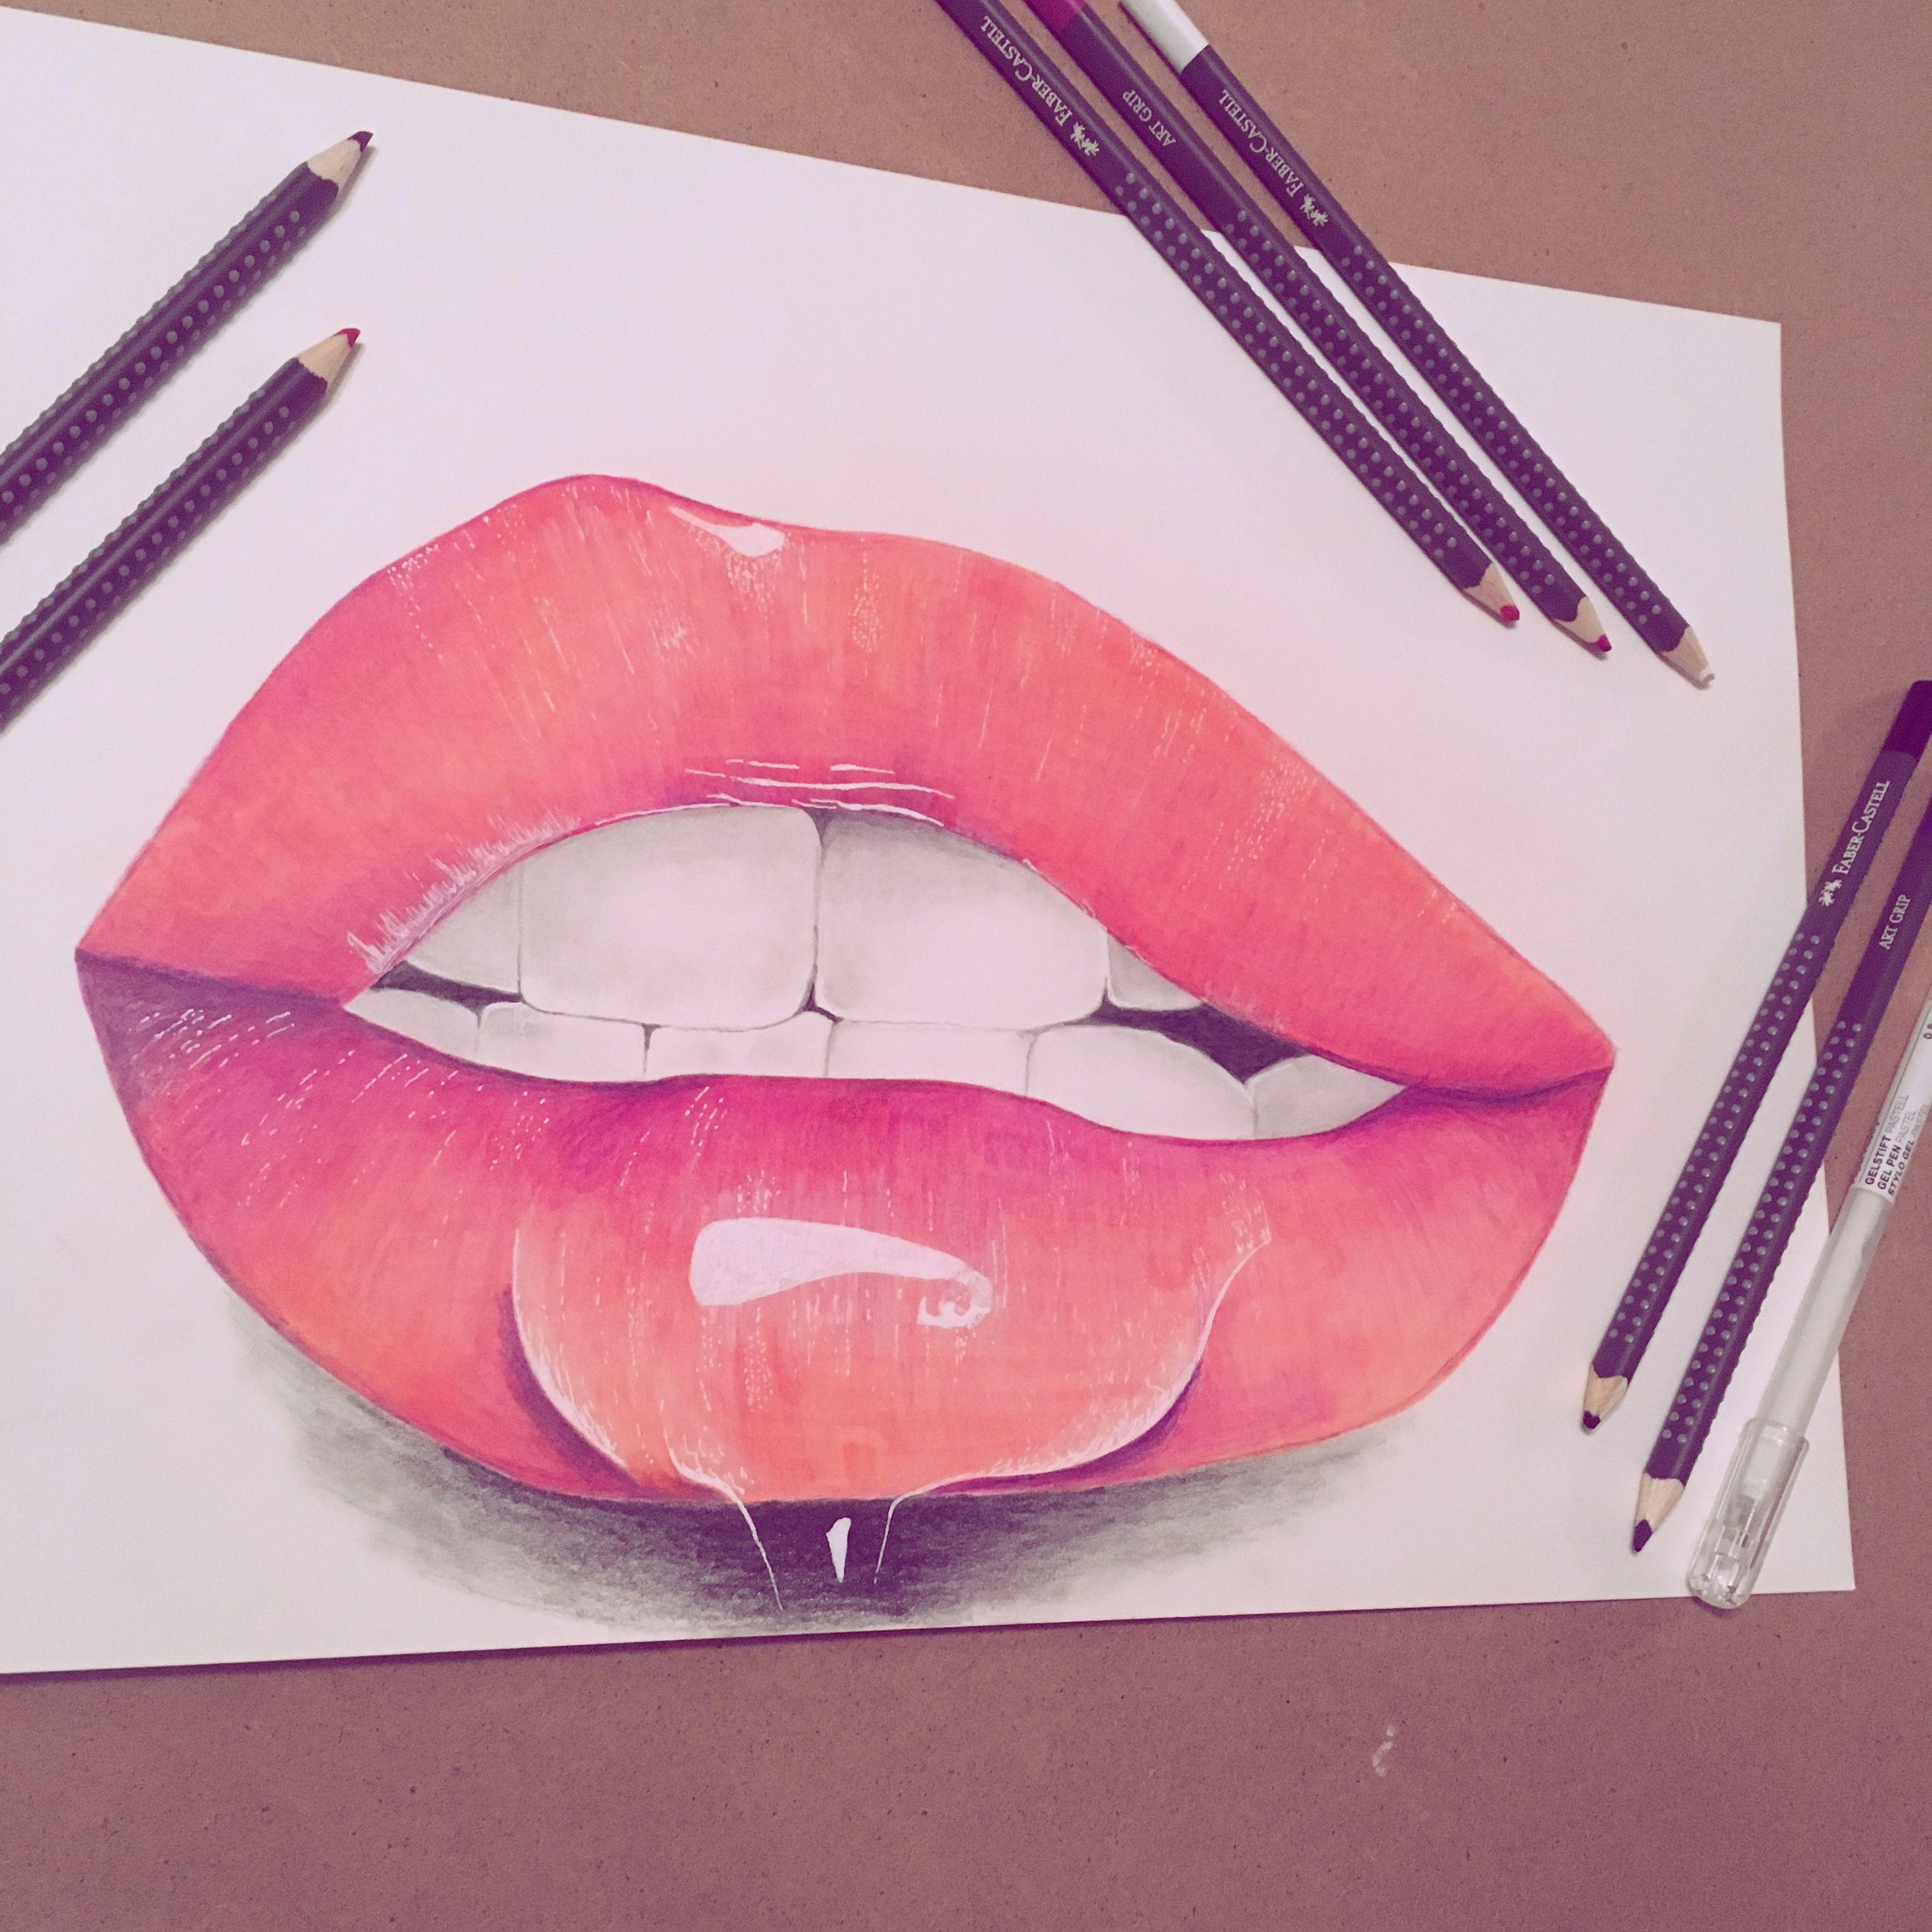 Lip Drawing Lip Gloss Colour Pencils Lip Drawing My Drawings